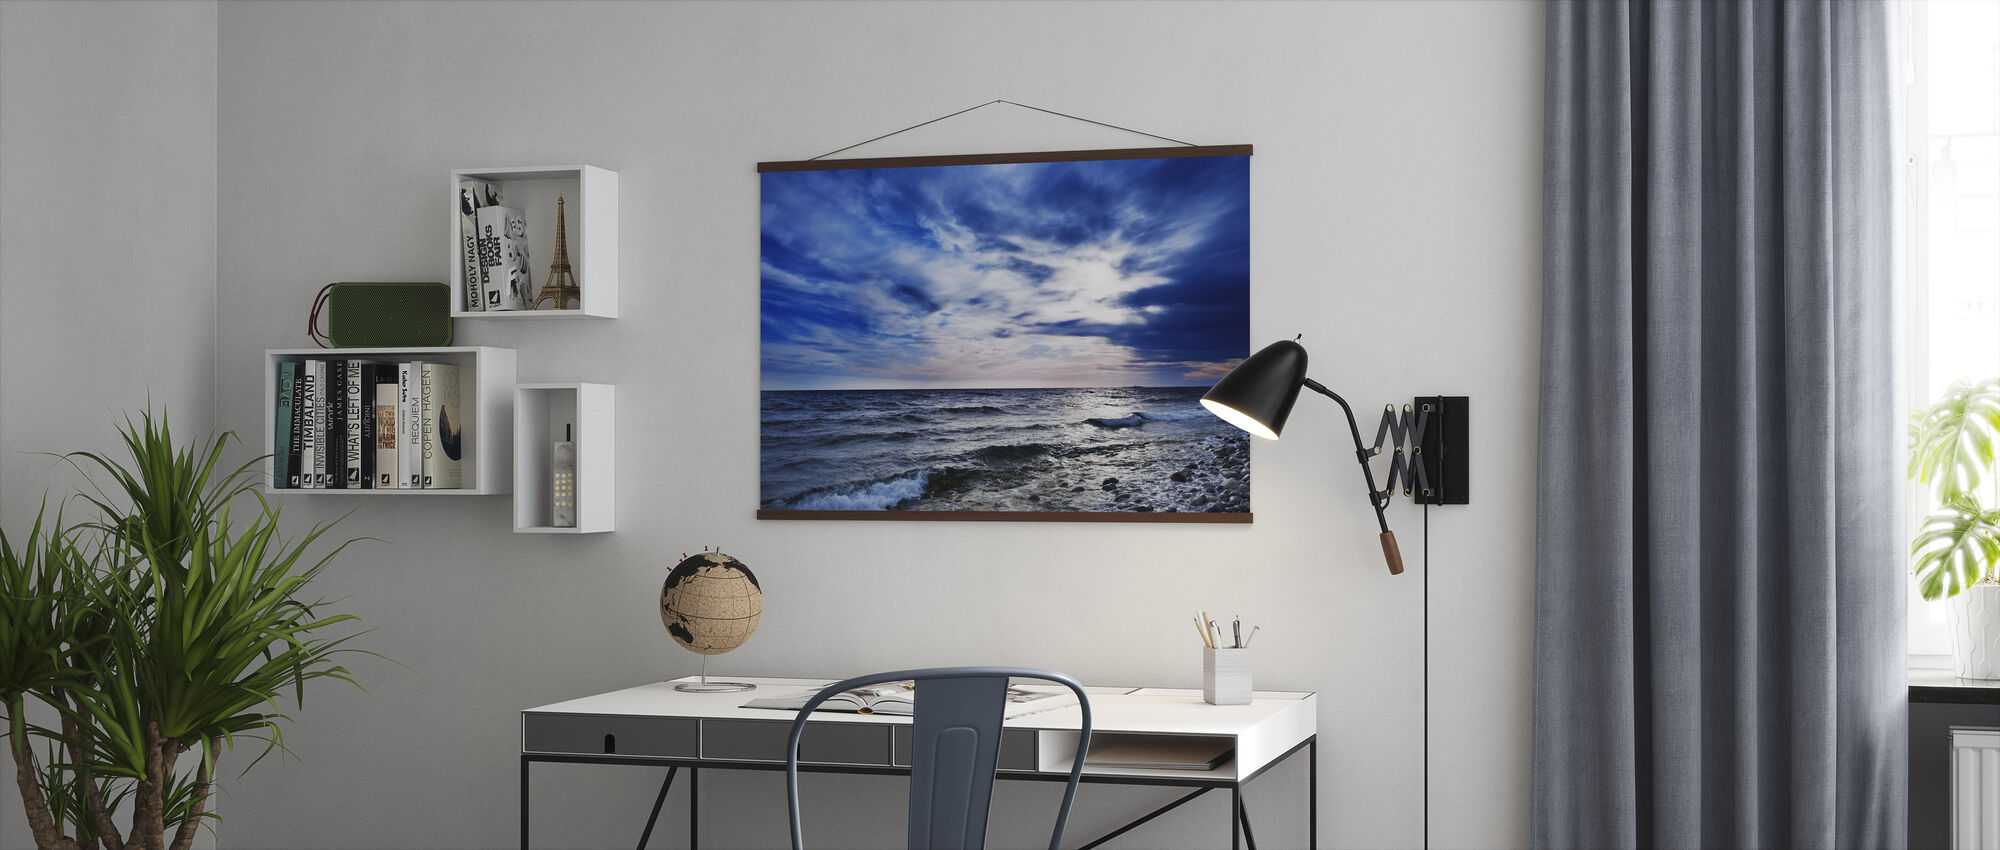 Blauwe golven van Torö, Zweden - Poster - Kantoor